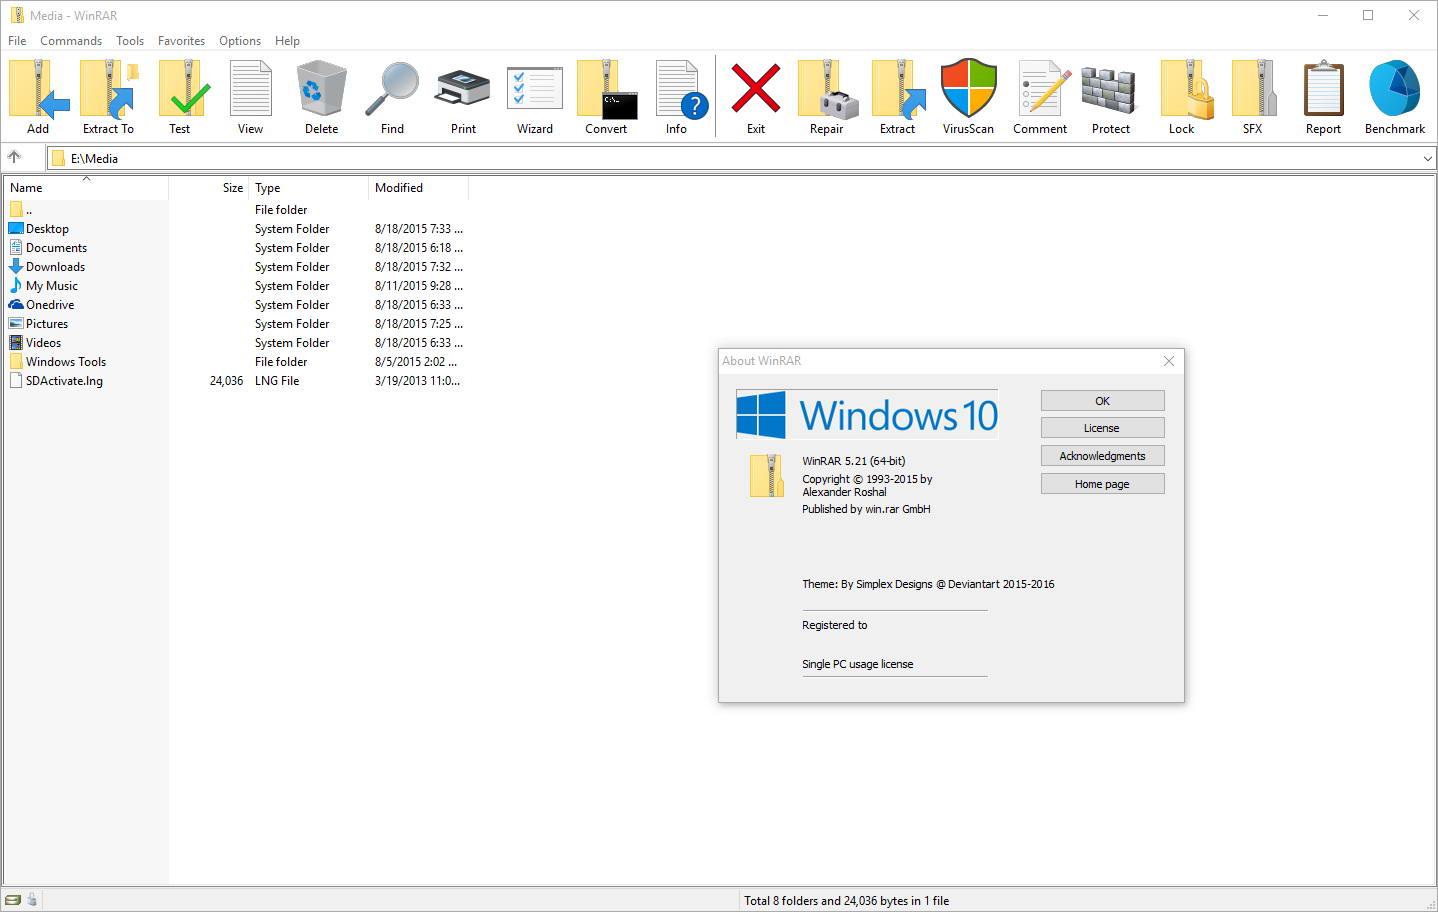 Winrar 64 bit download for windows 7/10.